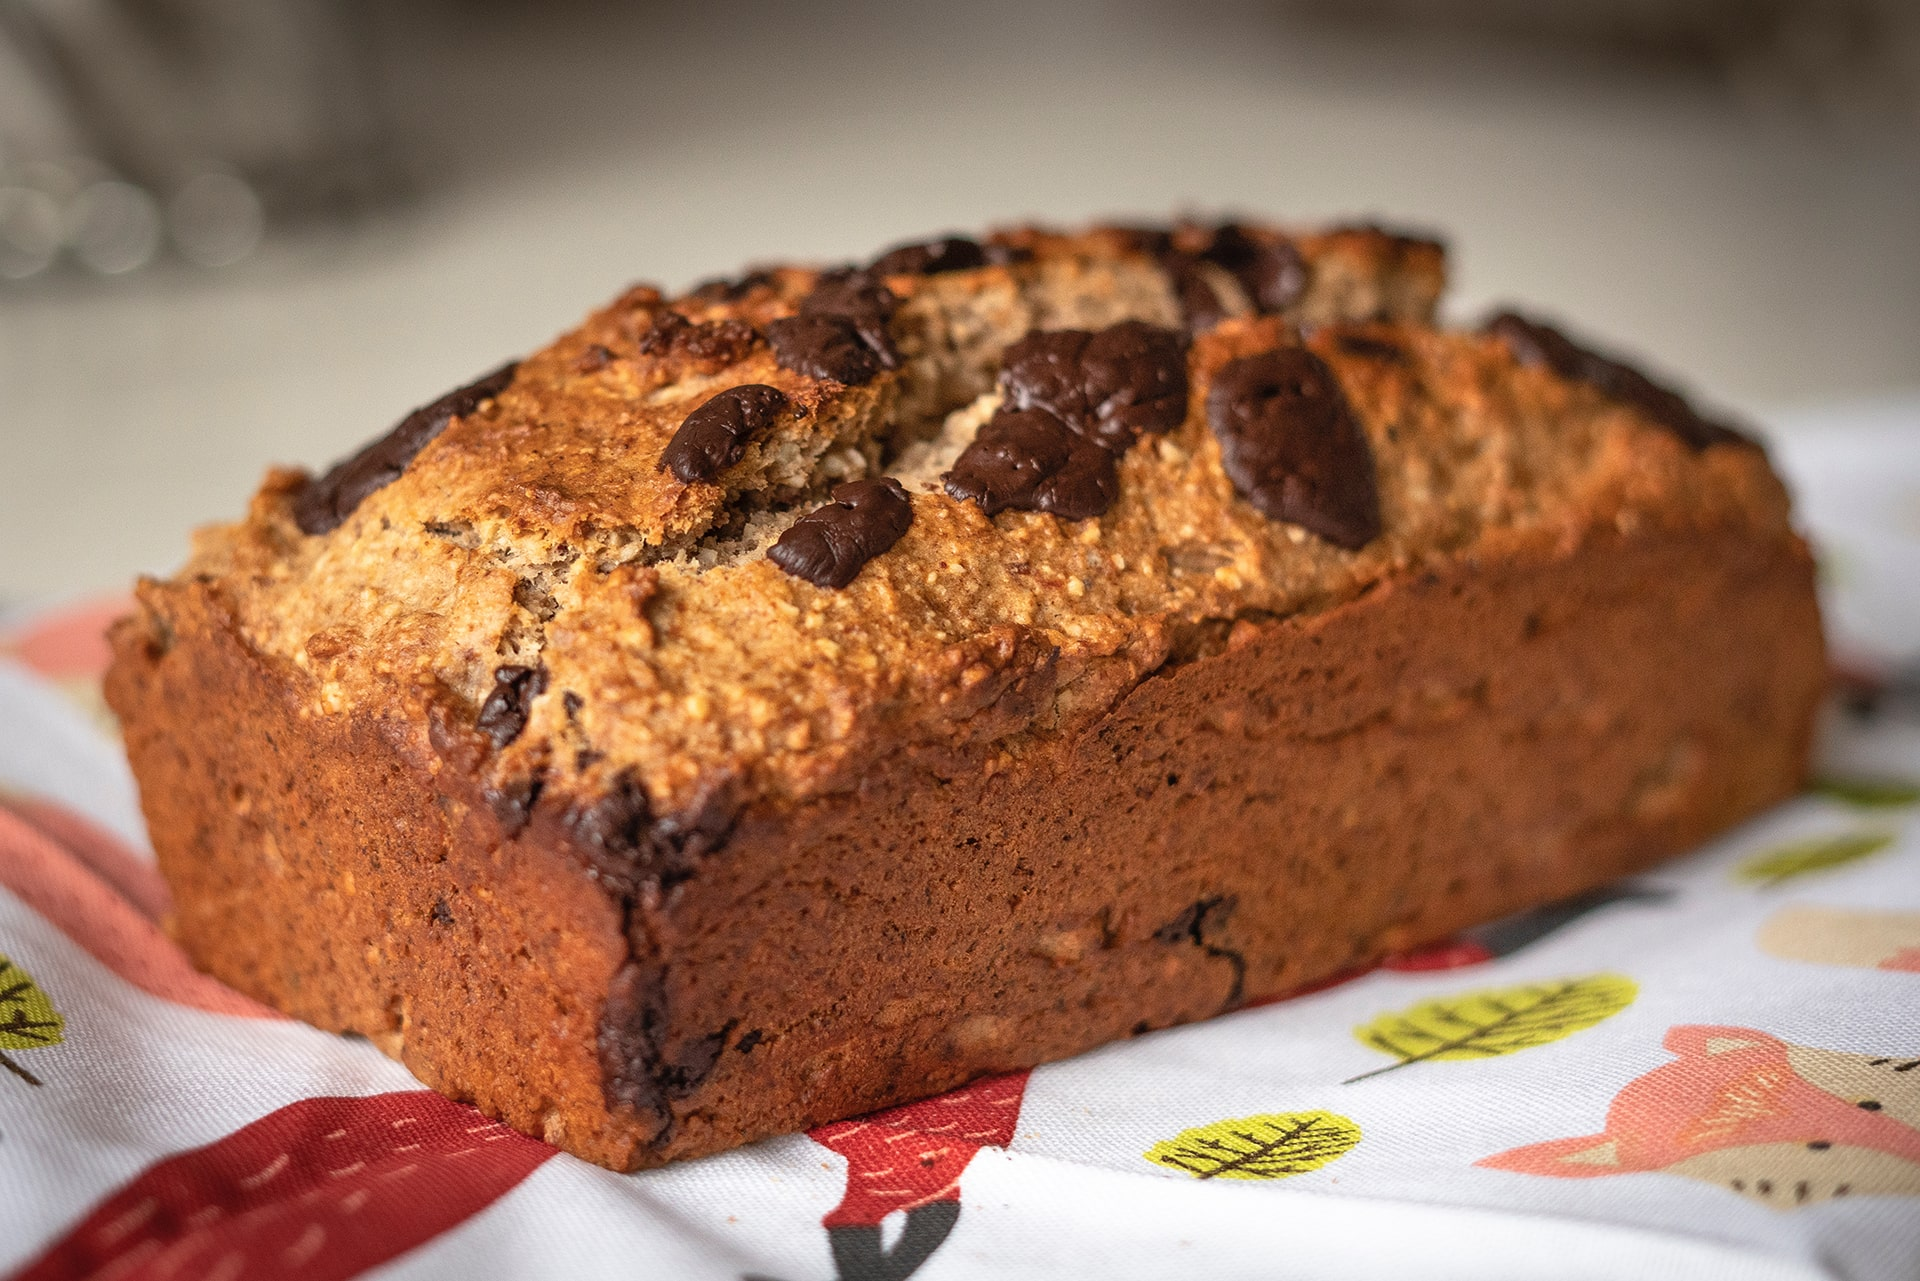 Blog Lifestyle - Le banana bread végan by Elodie - Suivre sa Joie - Saskia Parein